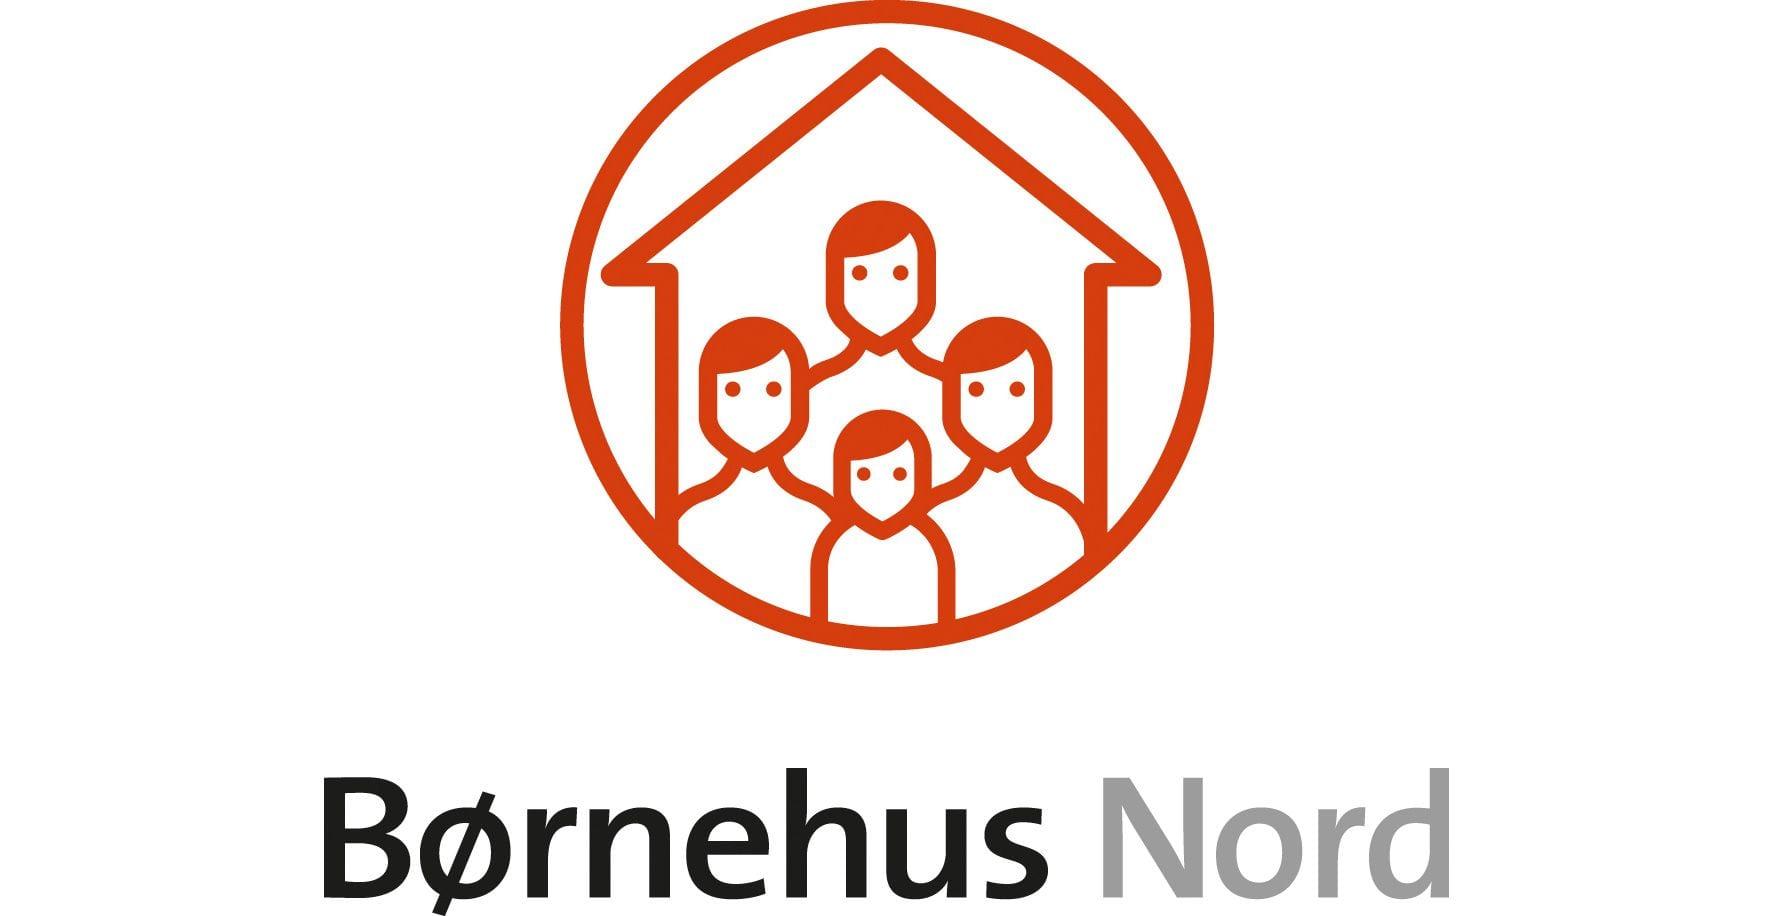 Børnehus Nord logo